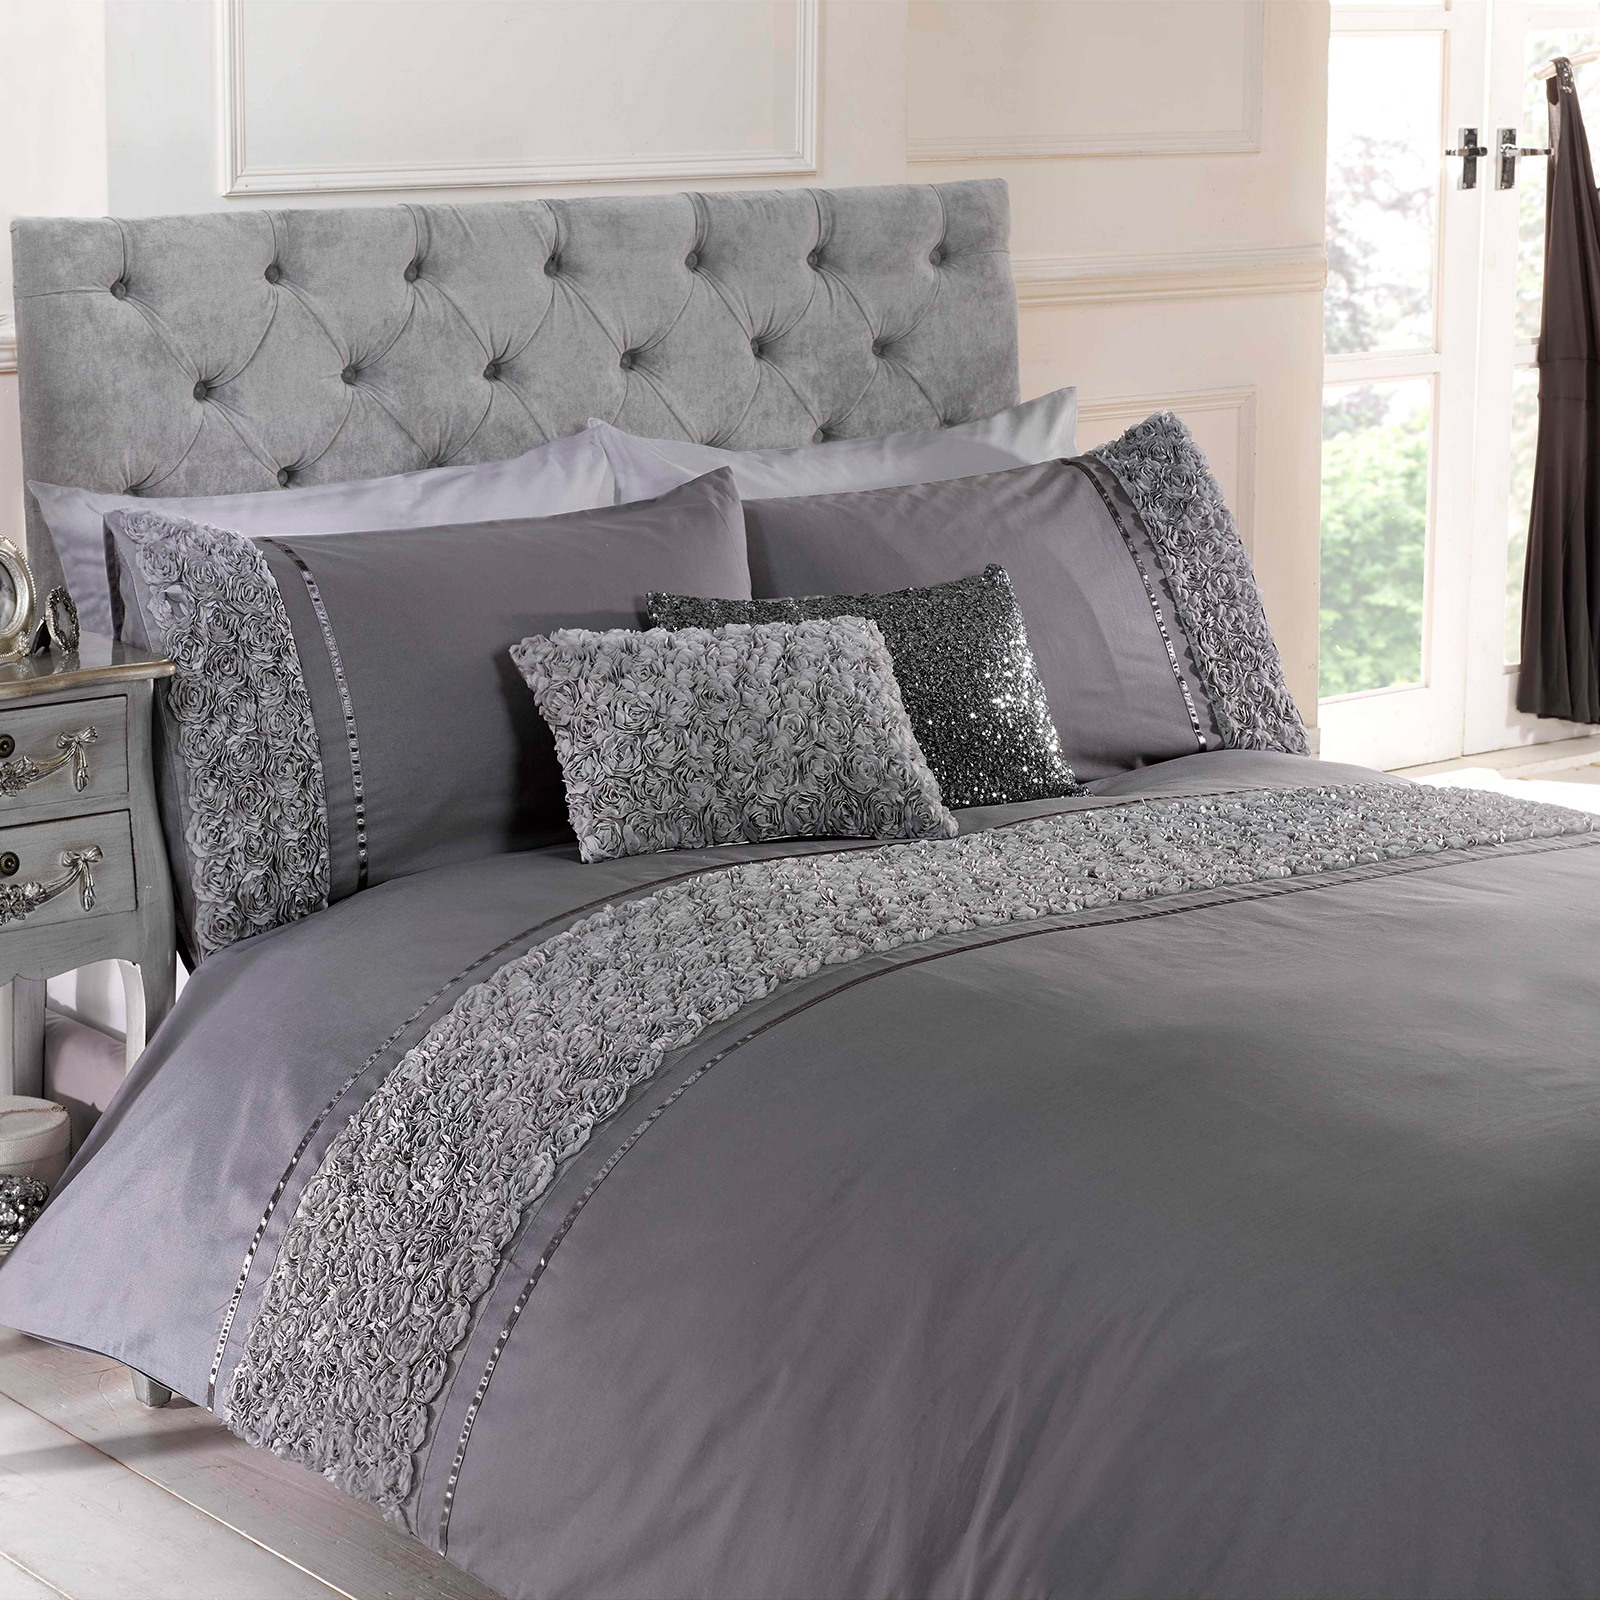 Modern quilt bedding - Rose Floral Ruffle Duvet Quilt Cover Vintage Chic